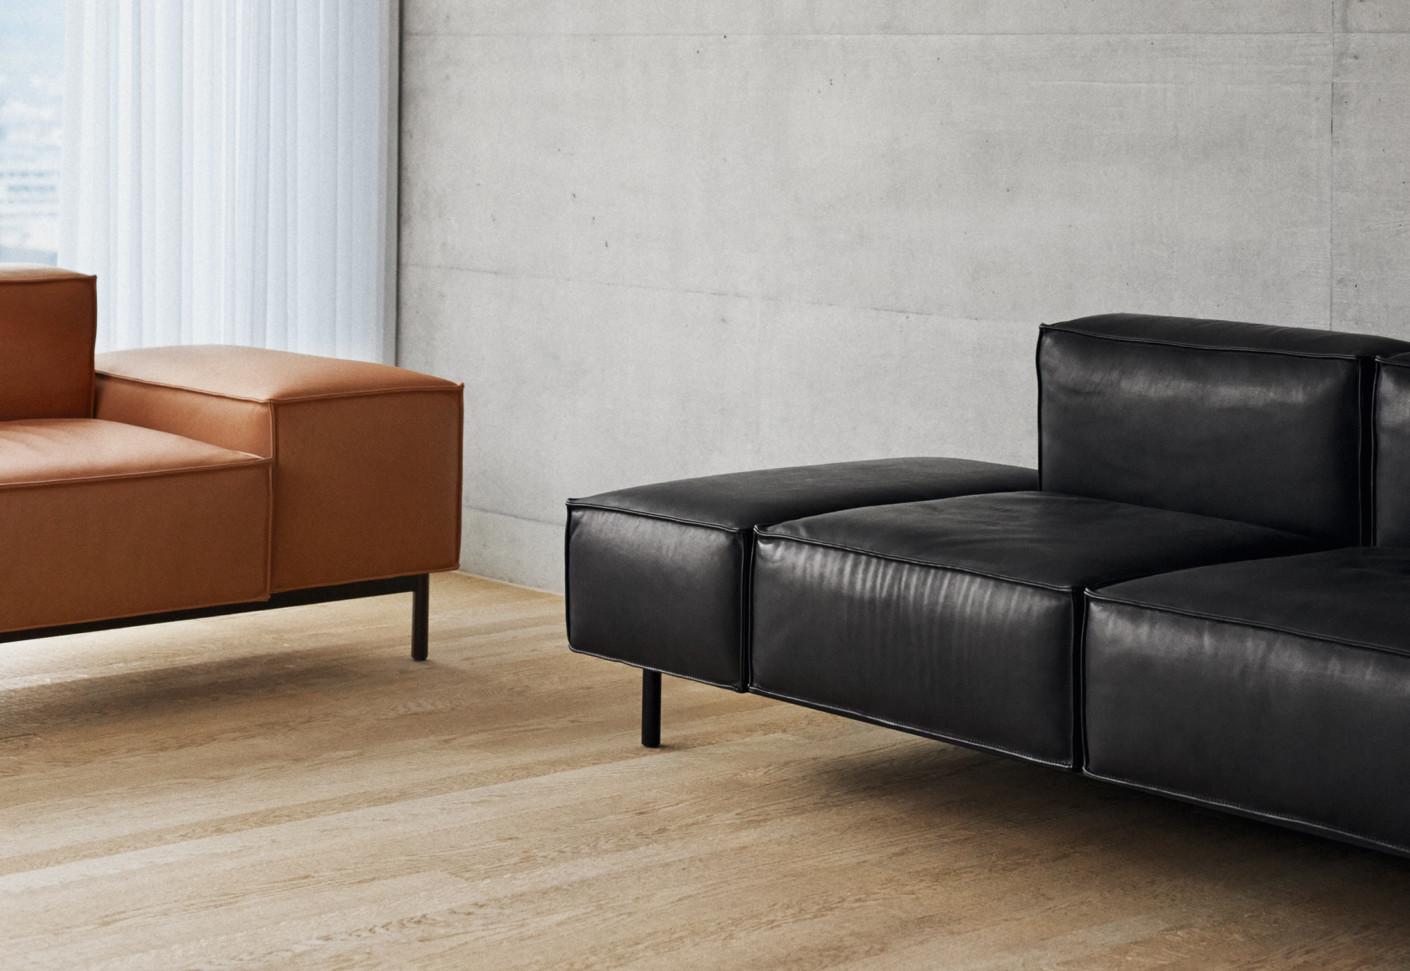 ds 21 sofa von de sede stylepark. Black Bedroom Furniture Sets. Home Design Ideas